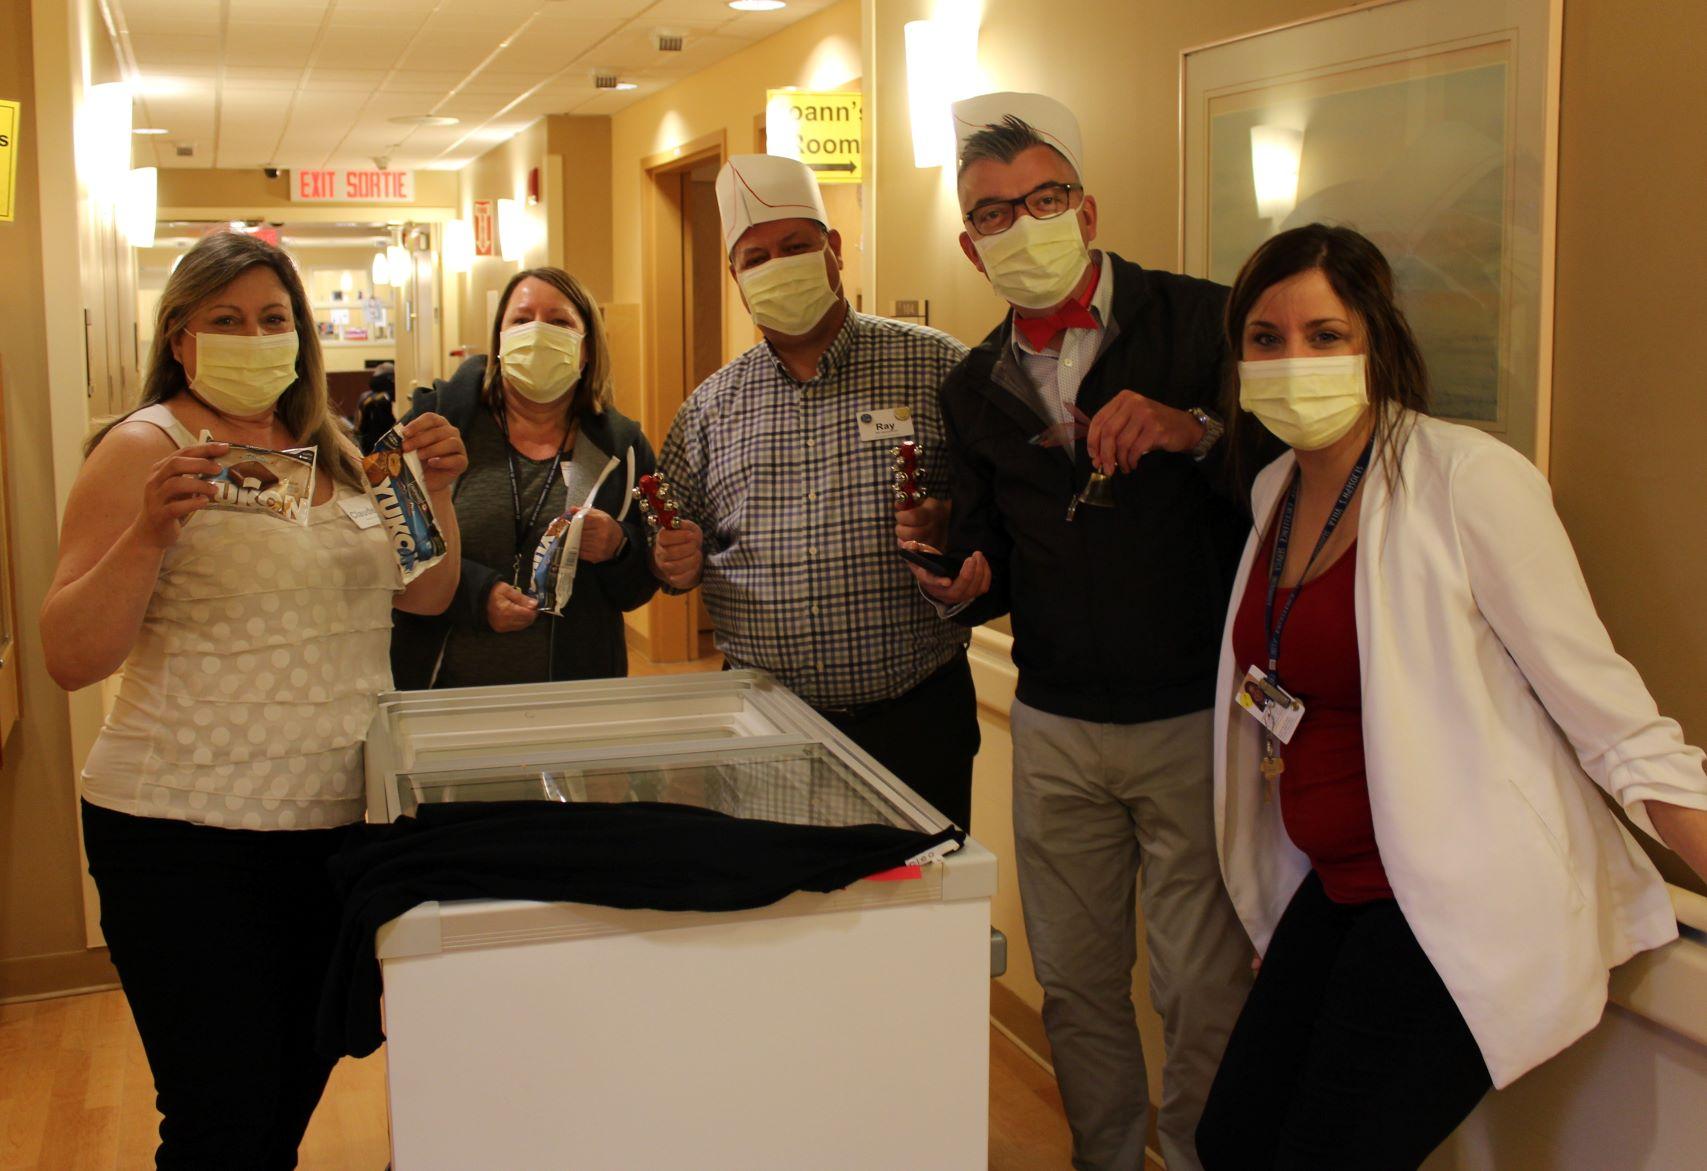 VSGV Staff with Freezer of Frozen Treats